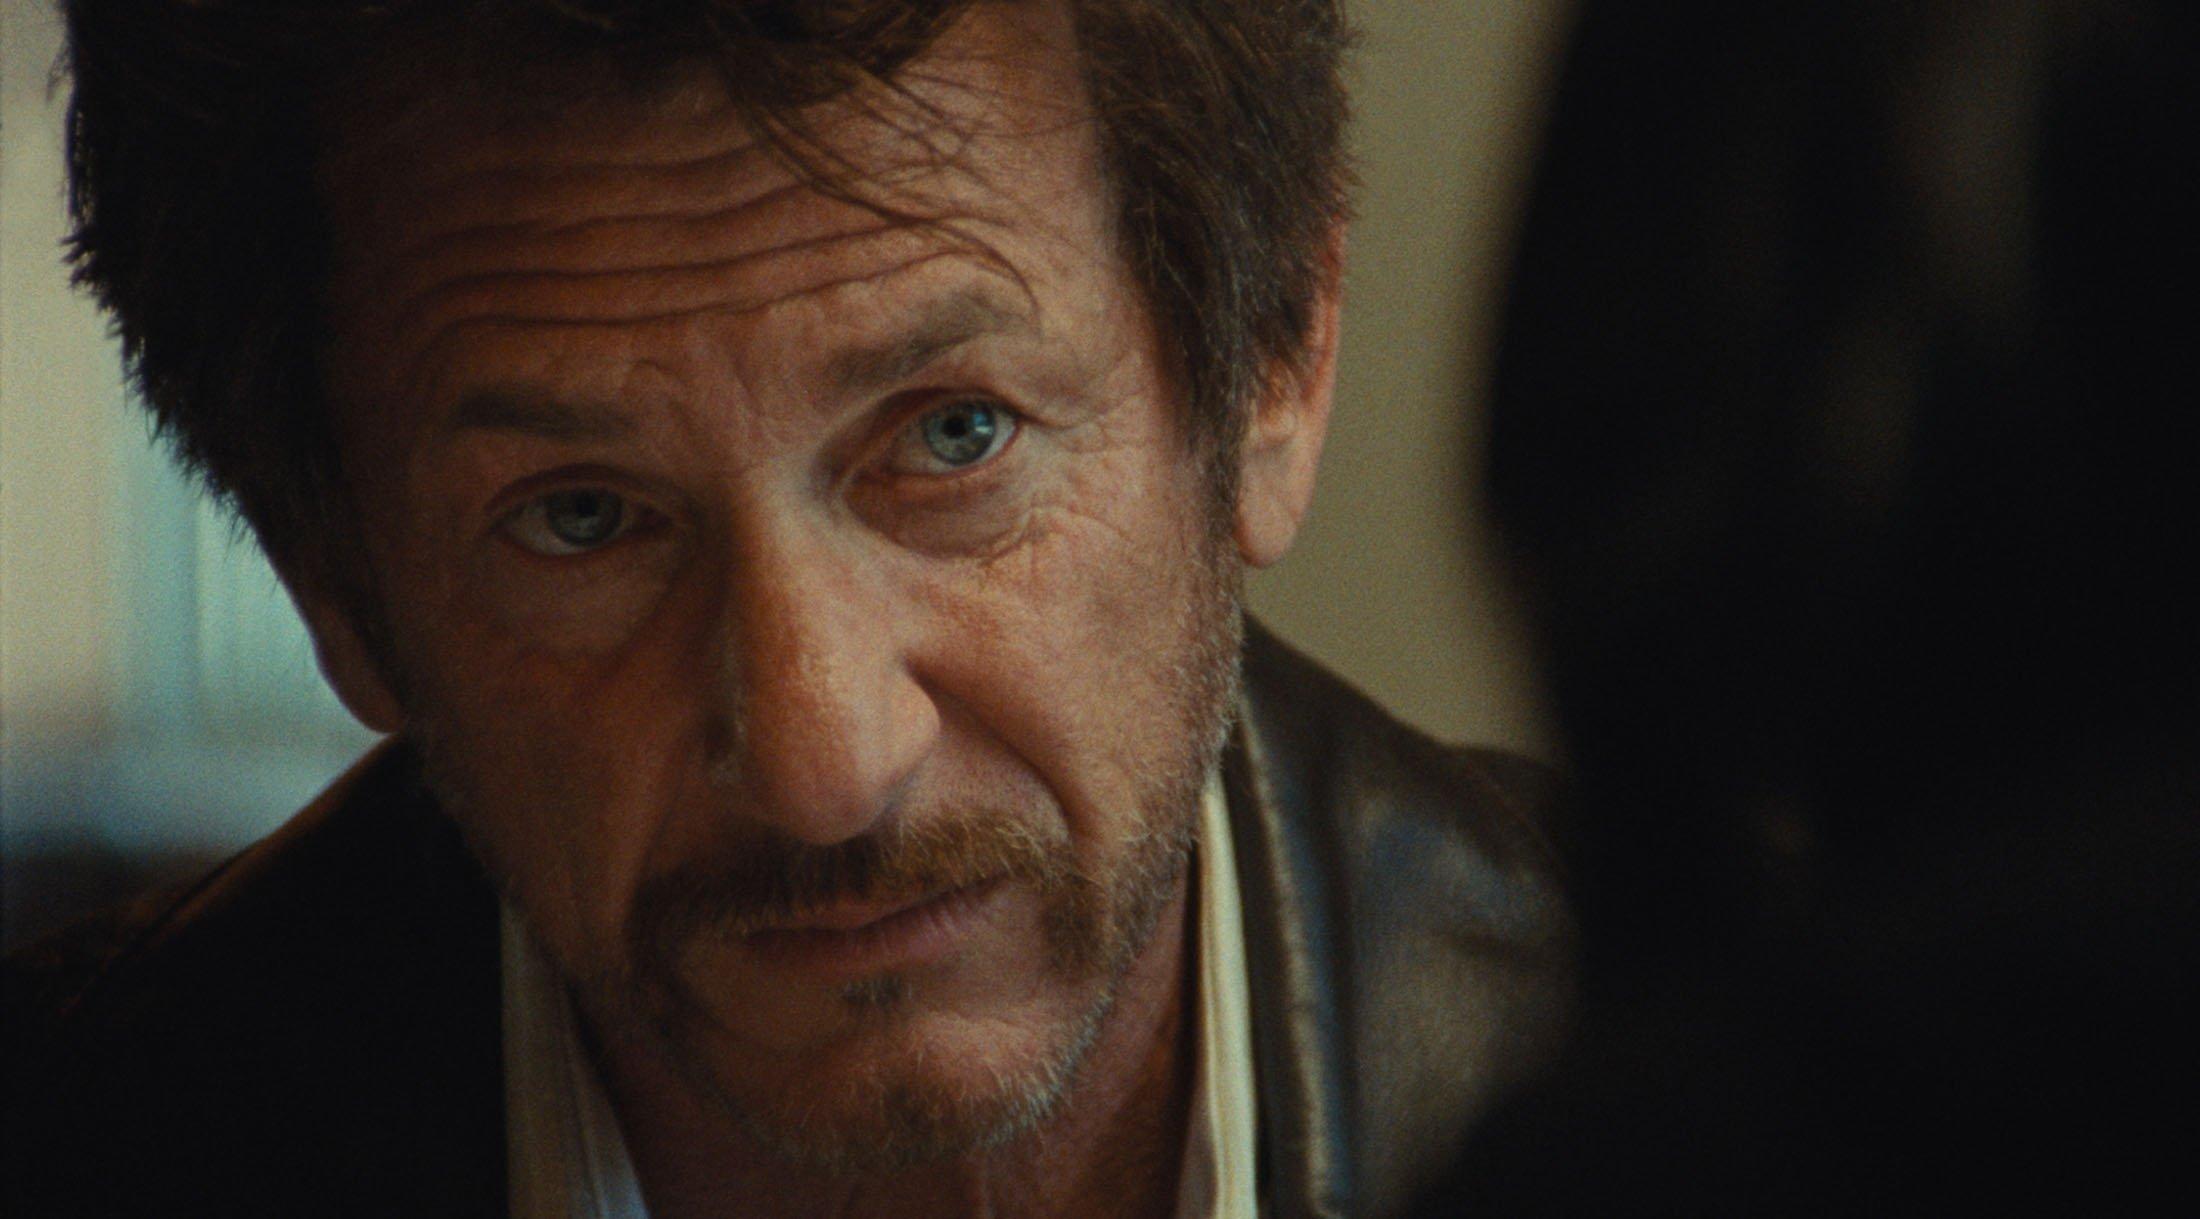 Sean Penn, in a scene from the film 'Flag Day.' (MGM via AP)